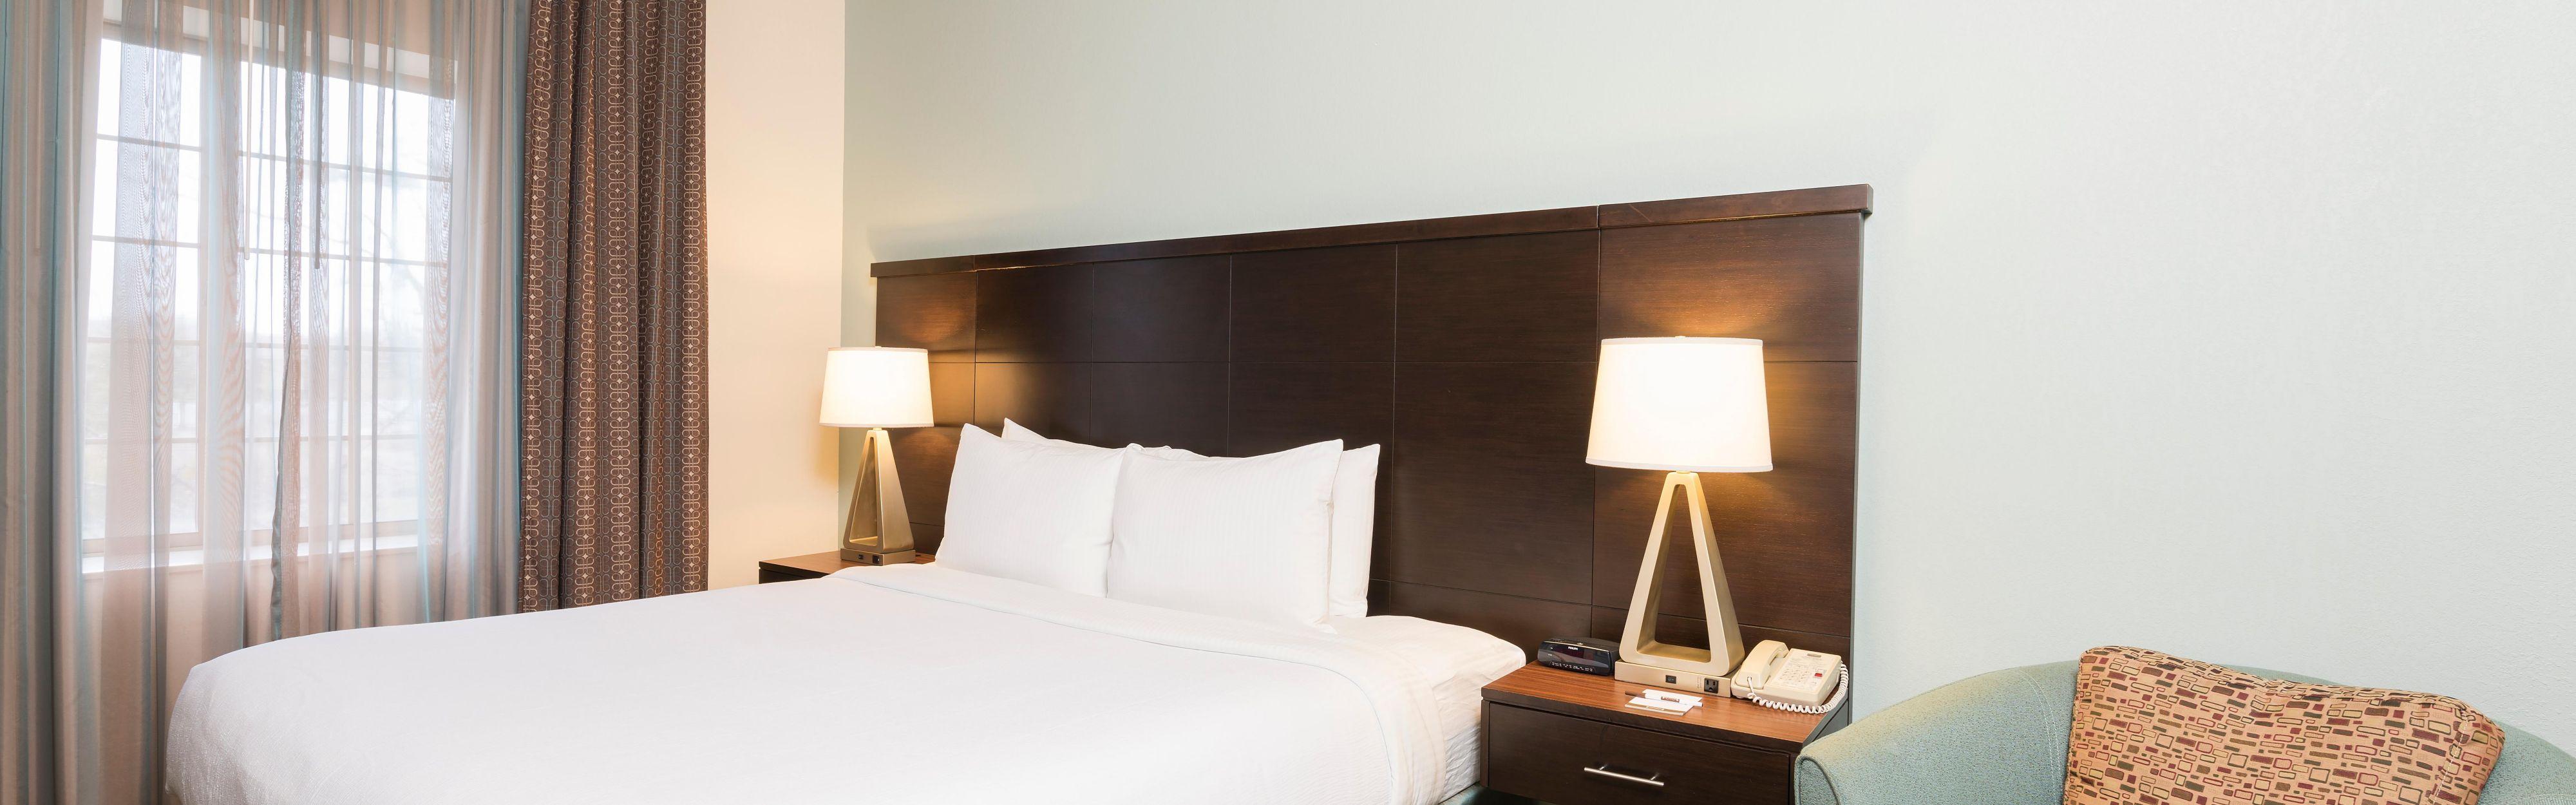 Staybridge Suites Chicago-Oakbrook Terrace image 1